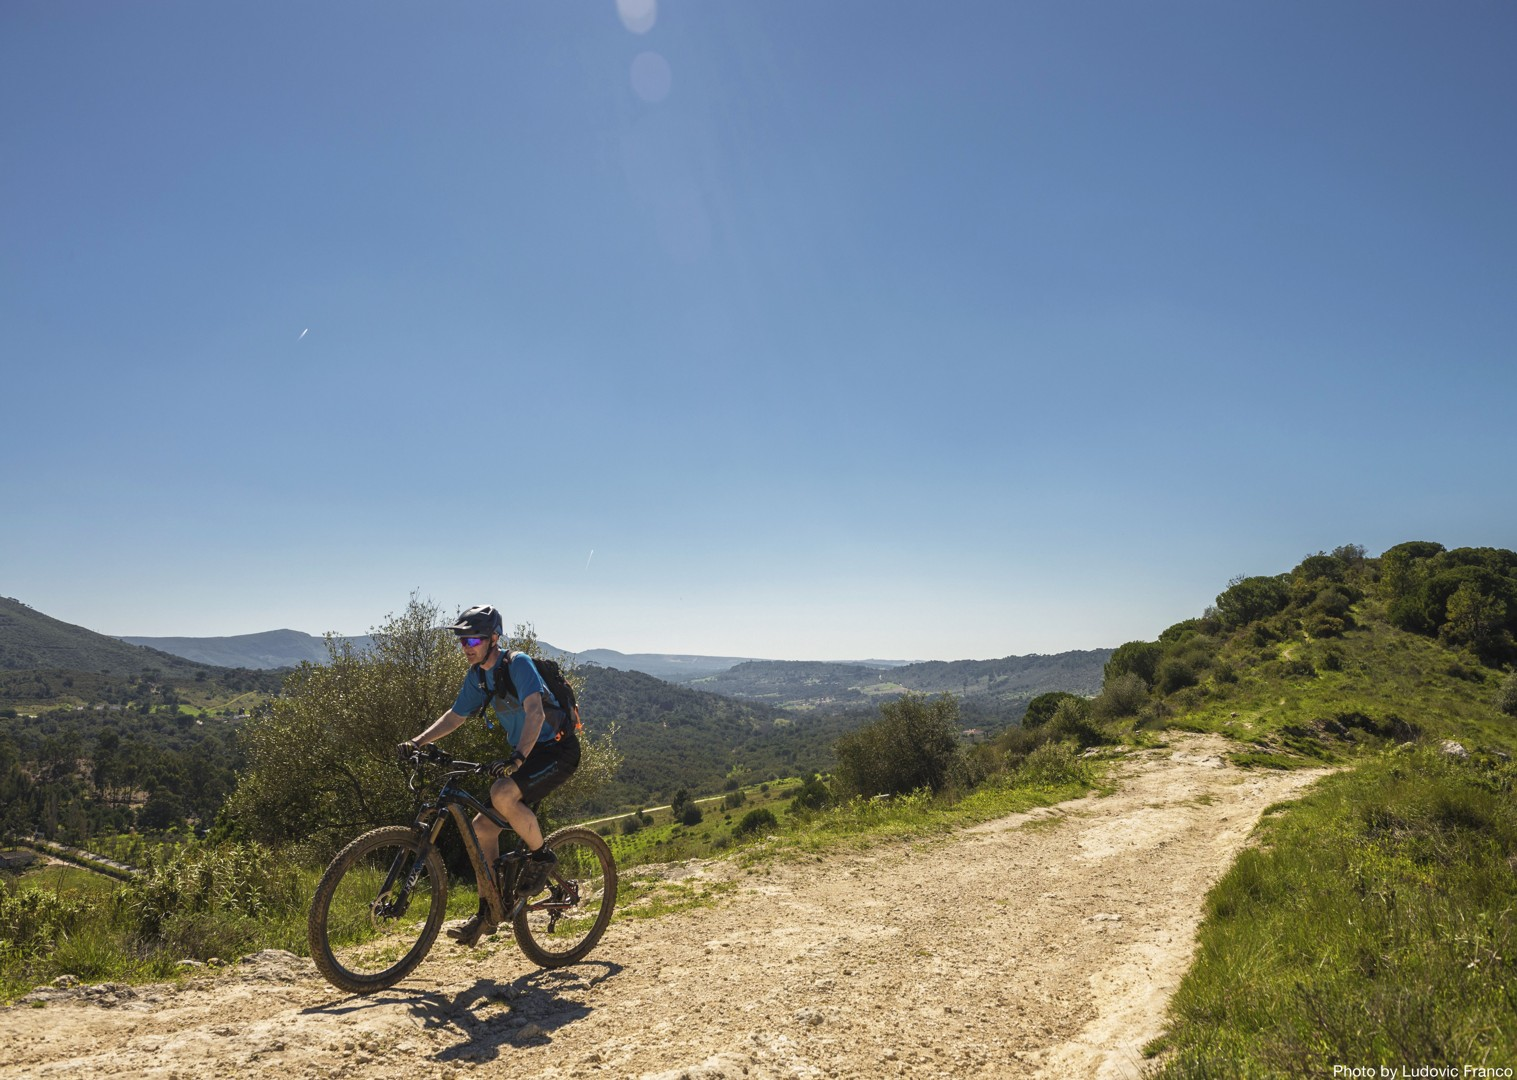 quiet-routes-hilltop-cycling-holiday-atlantic-trails-portugal.jpg - Portugal - Atlantic Trails - Guided Mountain Bike Holiday - Mountain Biking